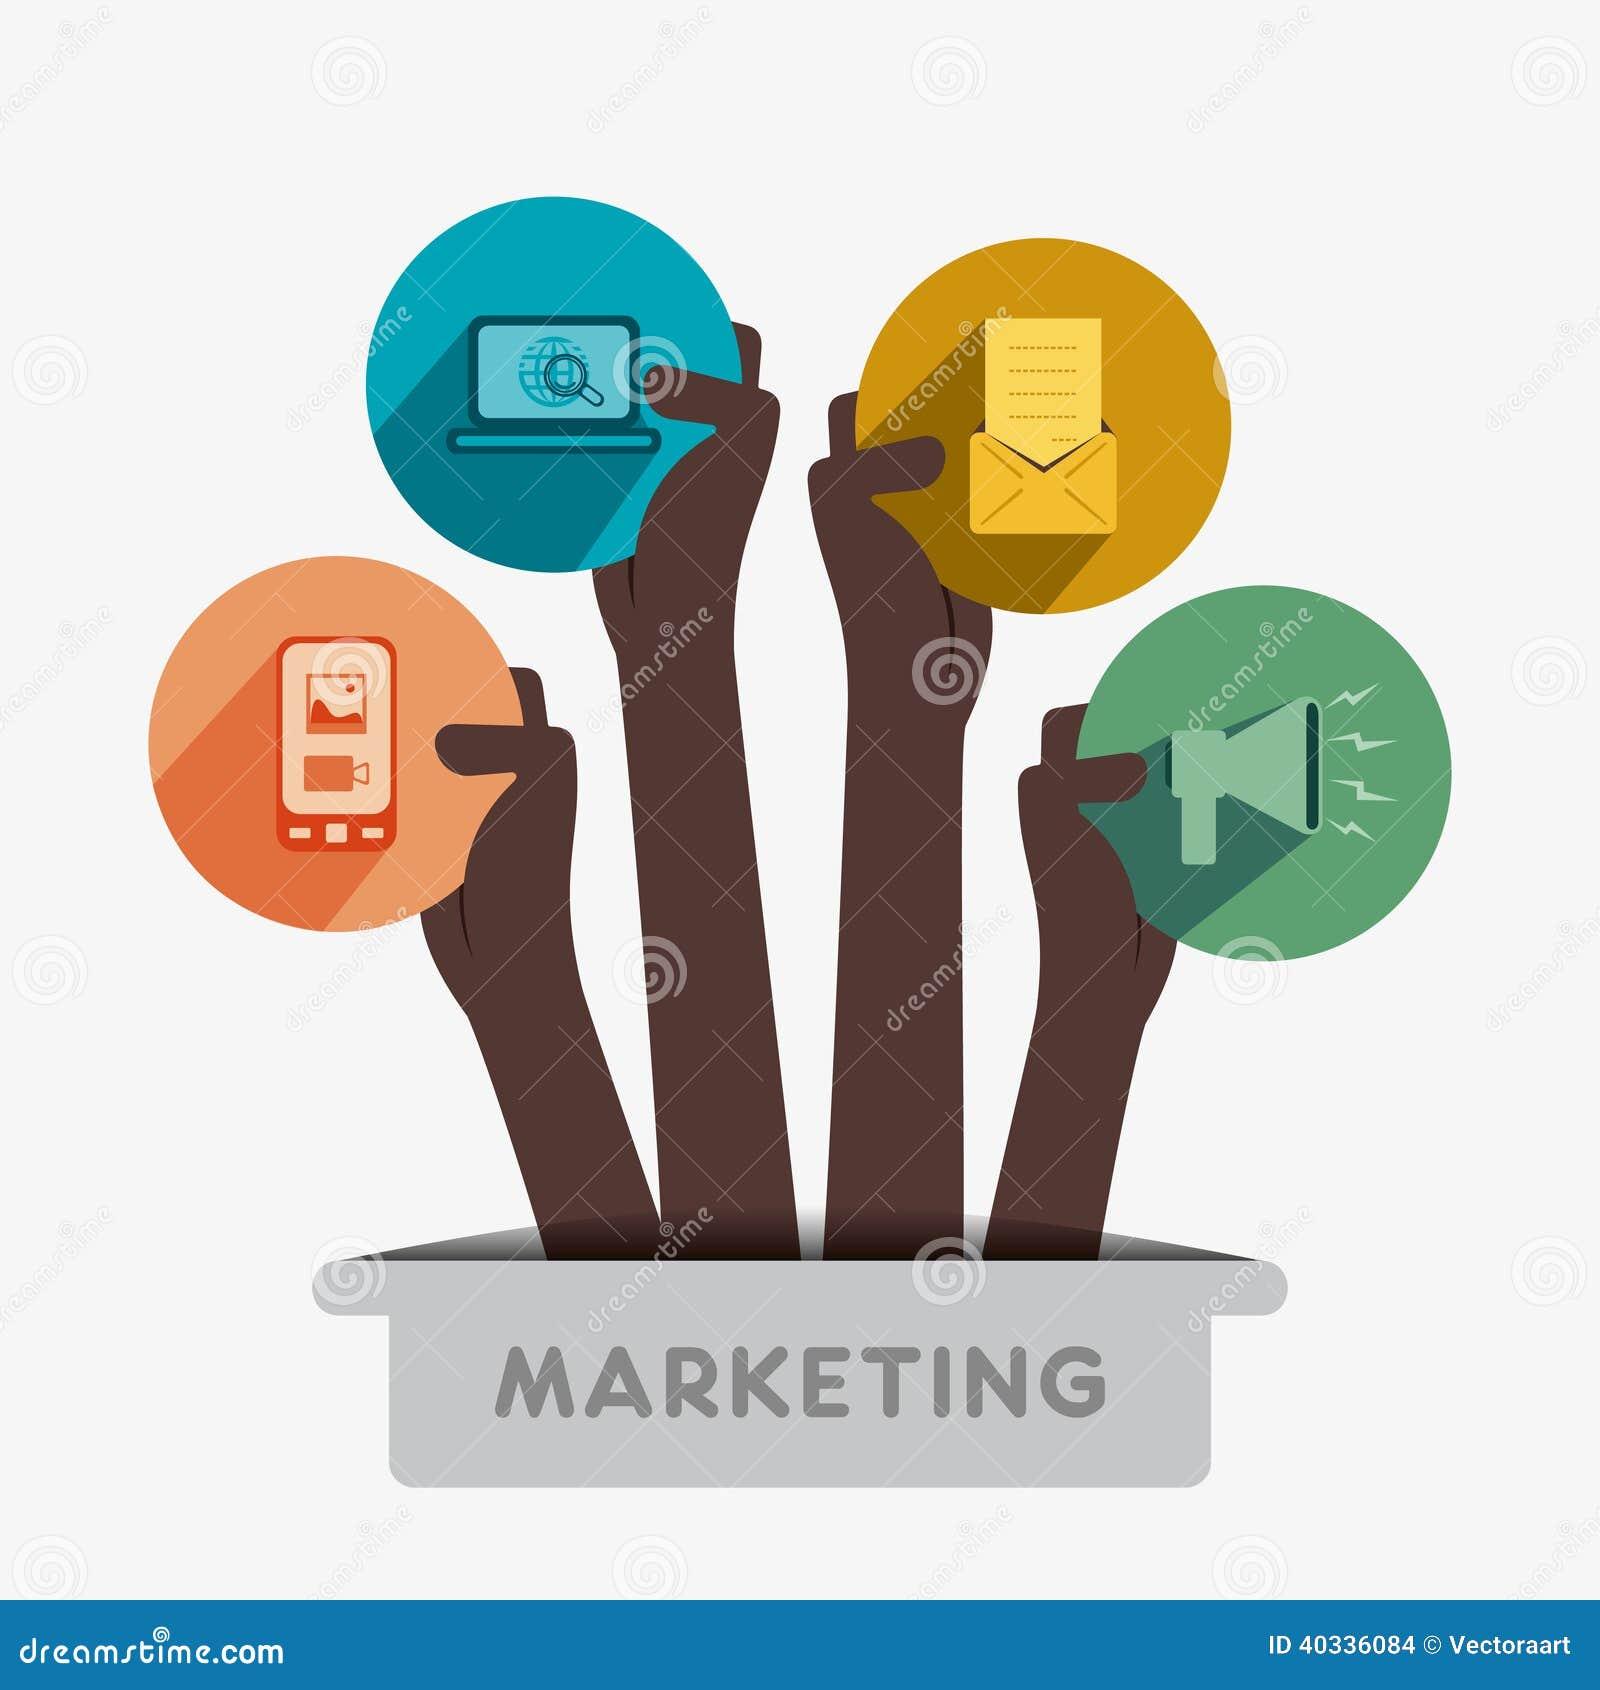 Creative Marketing Icon Stock Vector Illustration Of Flat 40336084